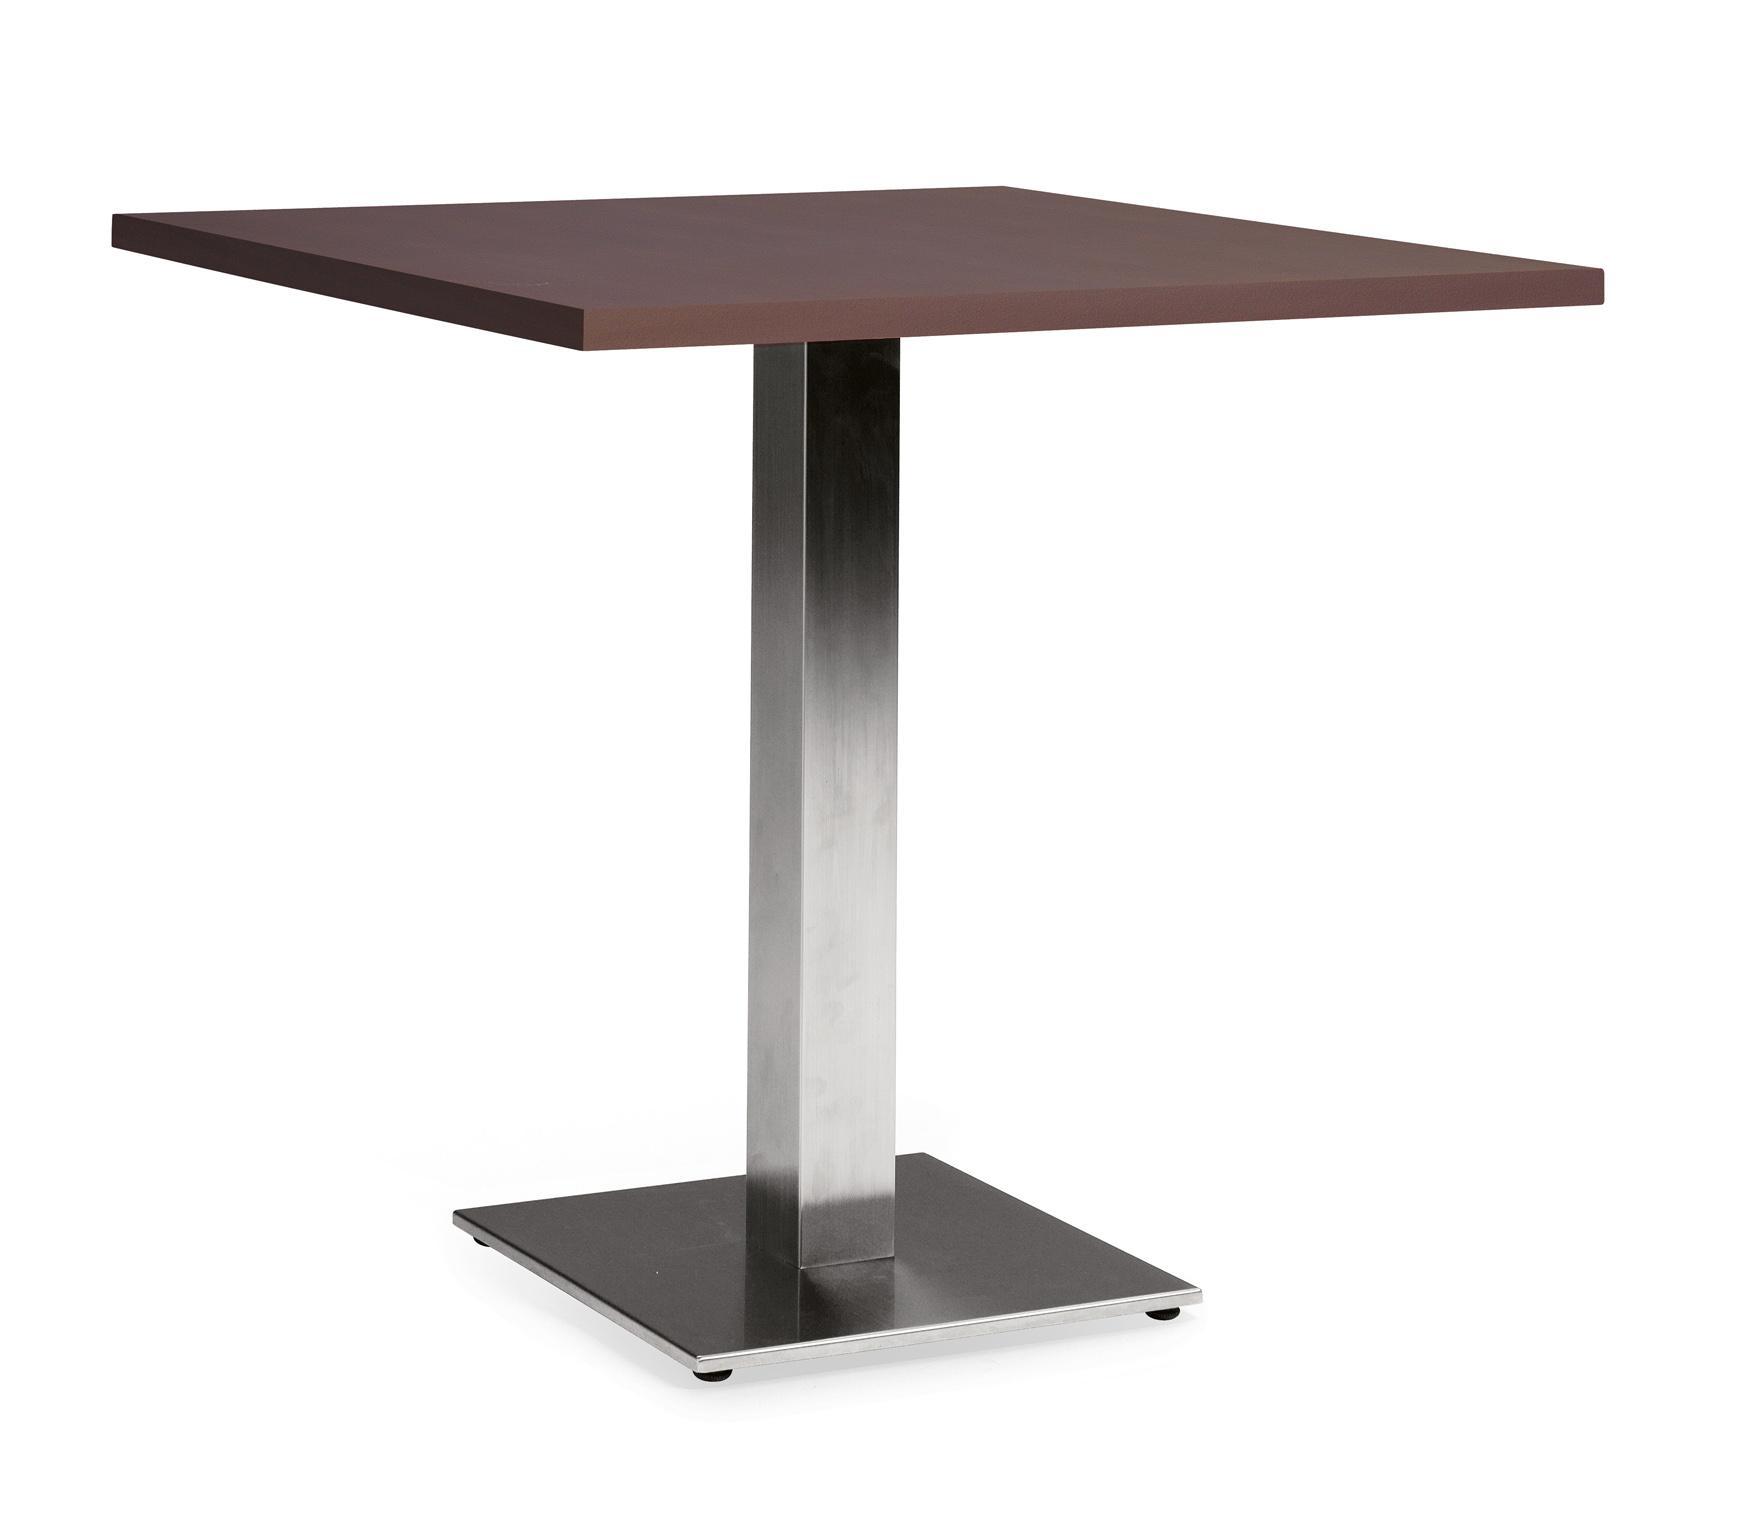 Tavoli per bar design 4 0 1000 0 pezzi for Tavoli design offerte